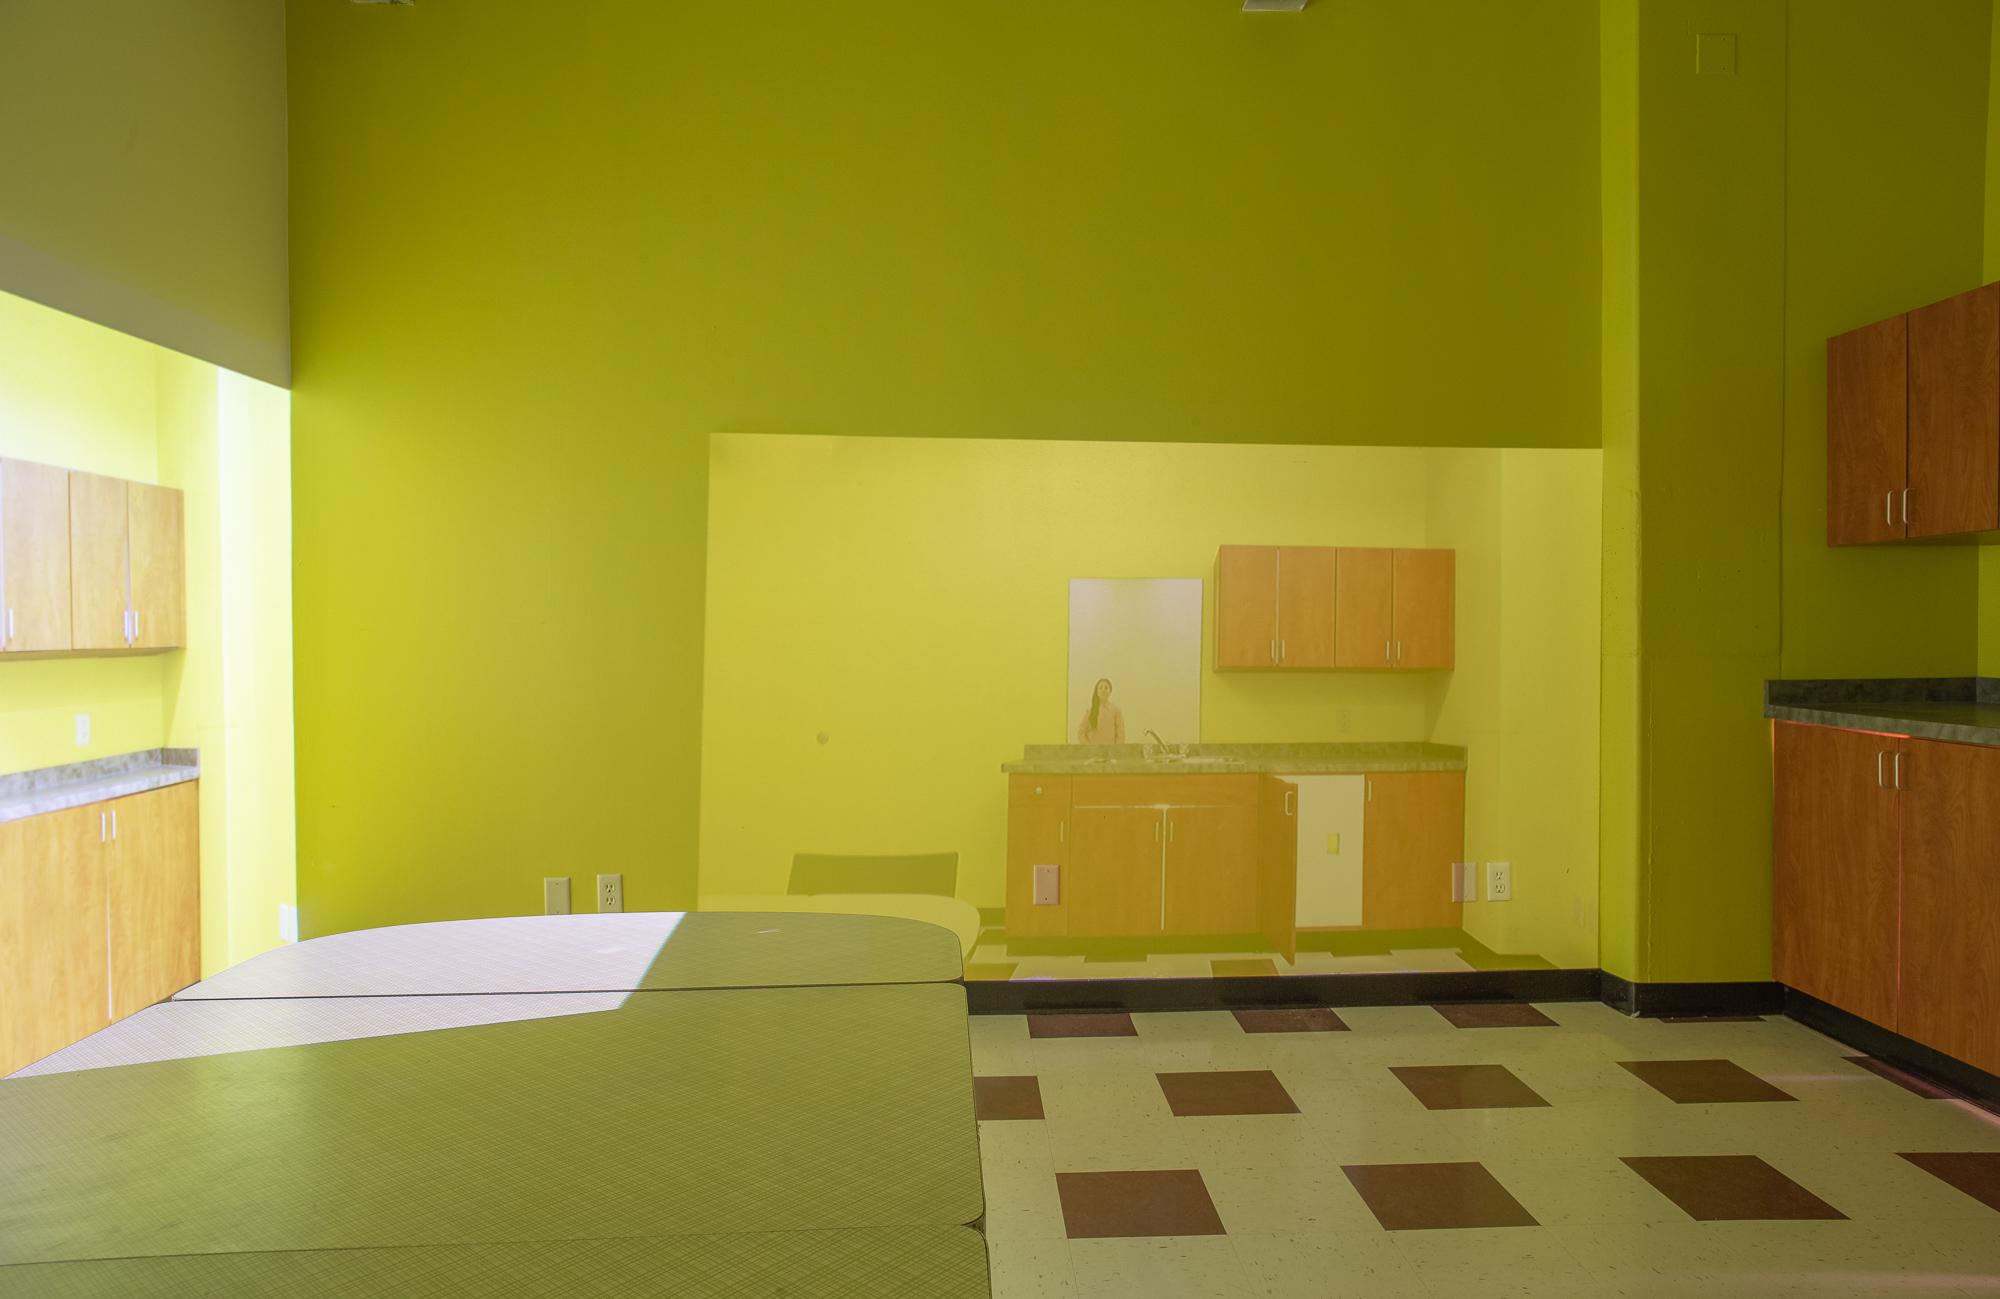 Alexandres_Delirium-Situ_Gilman_Yellow_Installation-IMG_6292-HDR.jpg